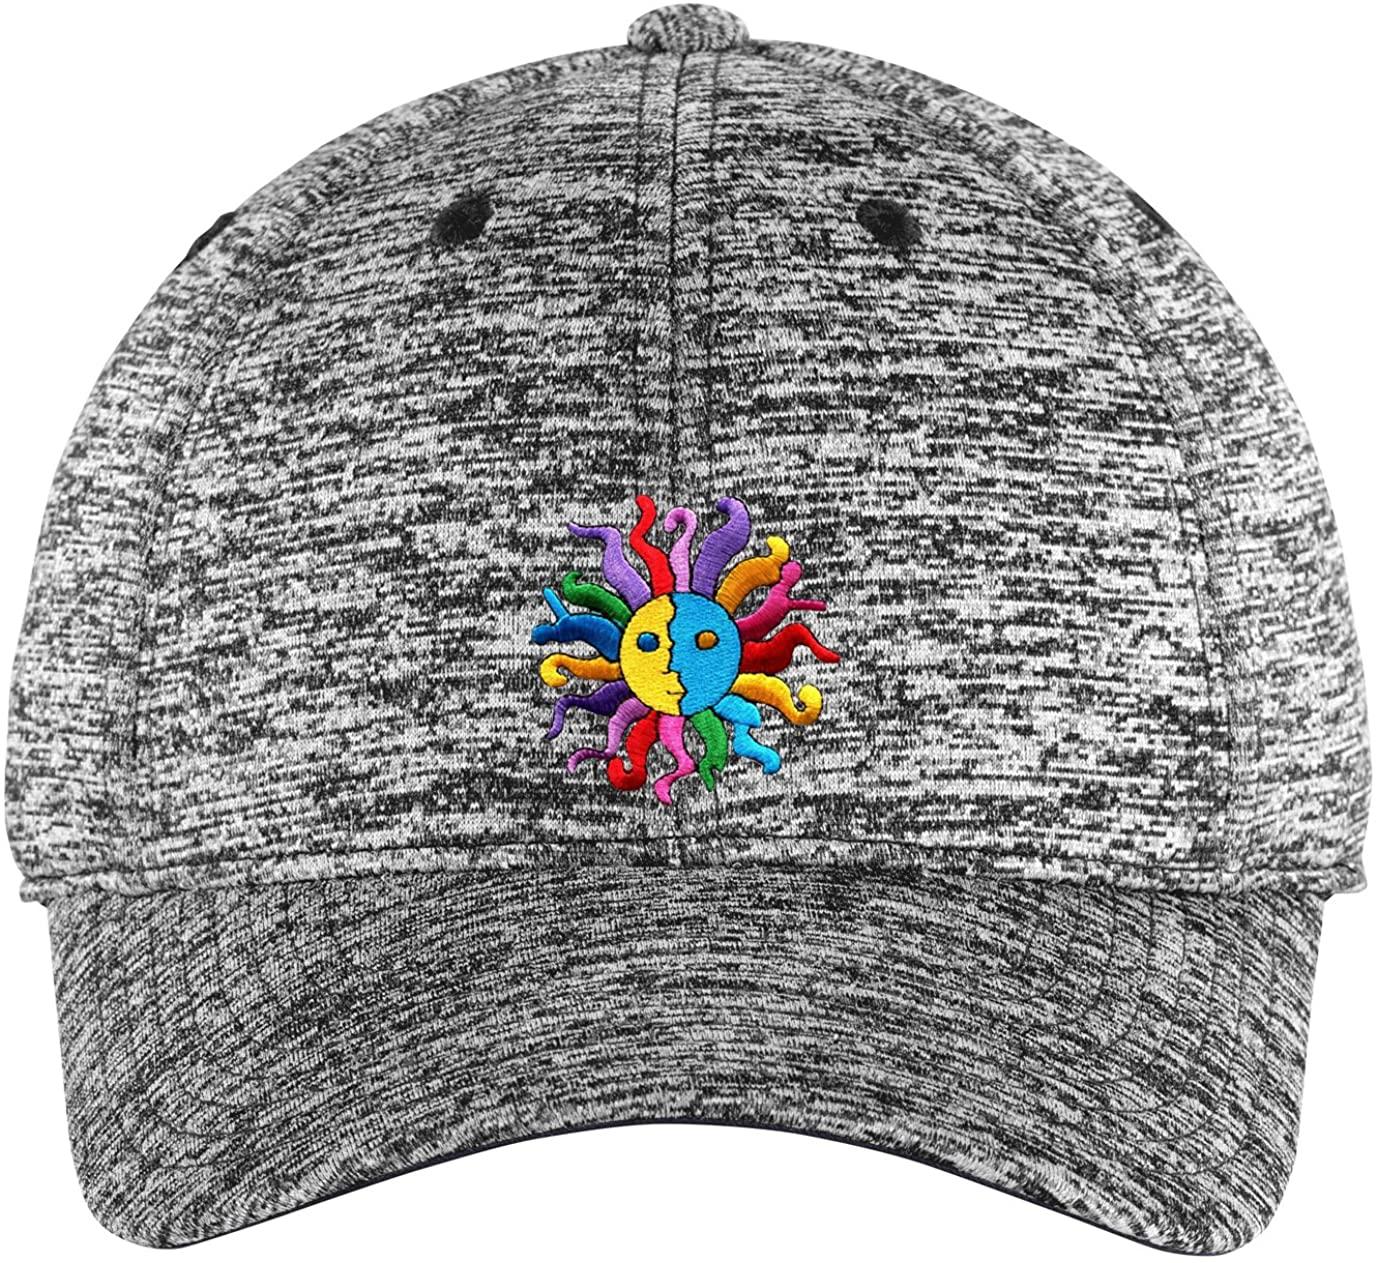 Unisex Hippie Sun and Moon Patch Hat Cap